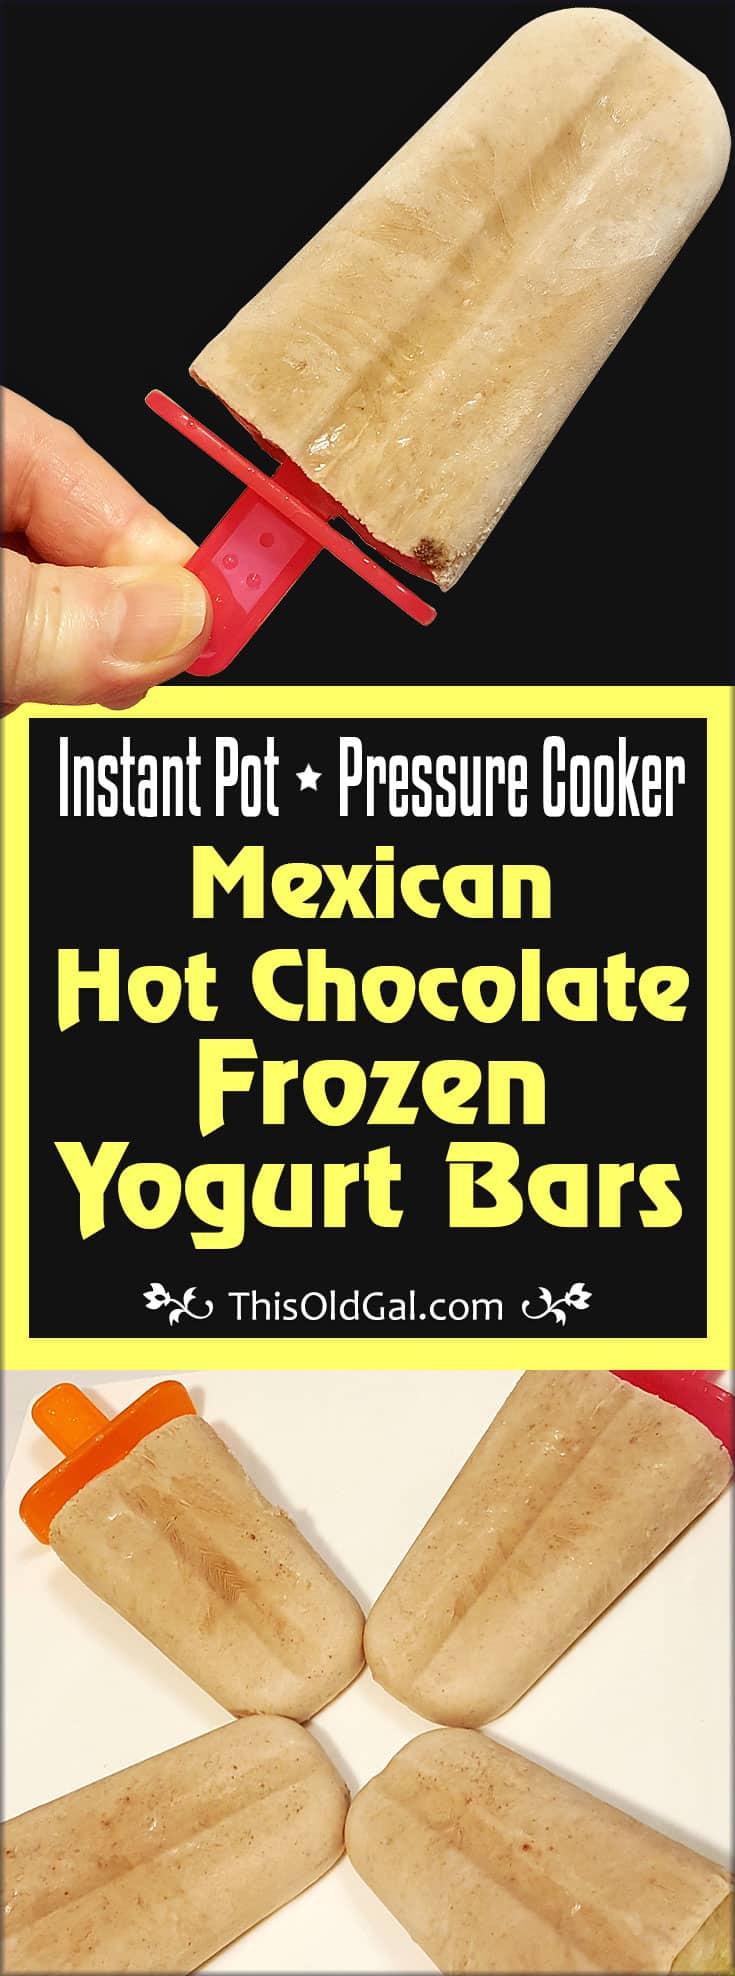 Instant Pot Mexican Hot Chocolate Frozen Yogurt Bars